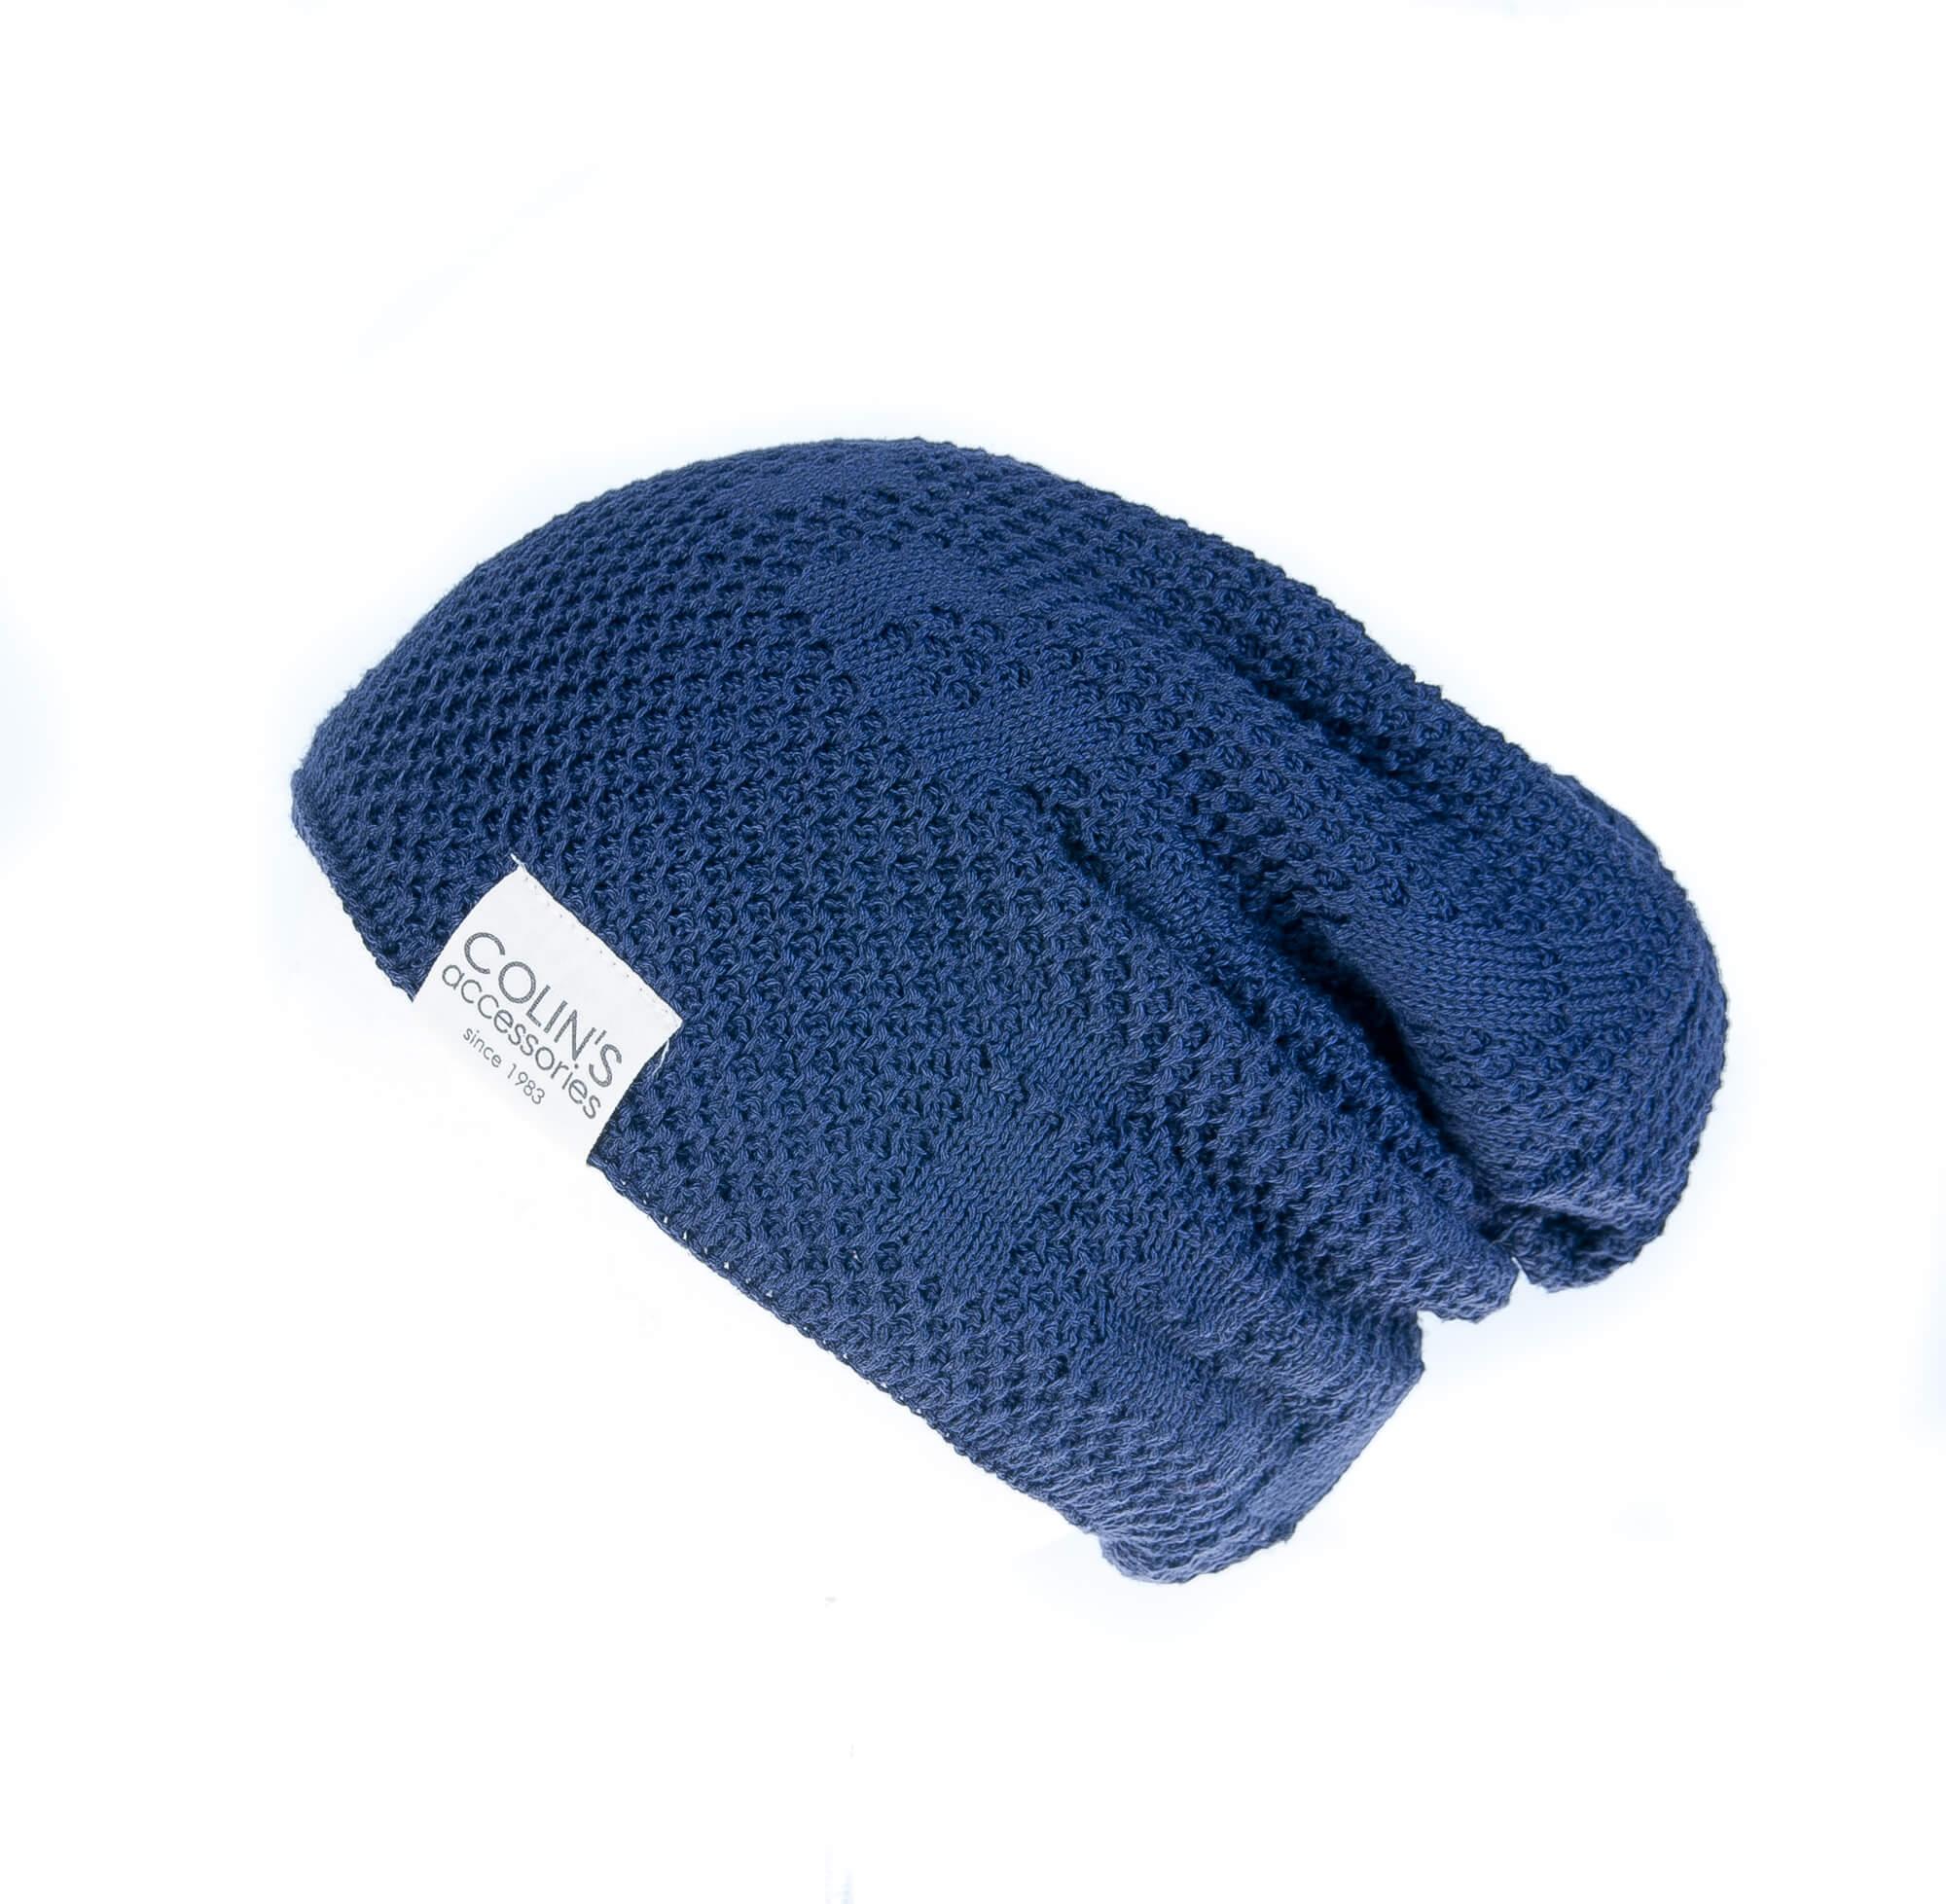 کلاه مردانه بافتنی COLIN'S ACCESSORIES – پشمی HW1004